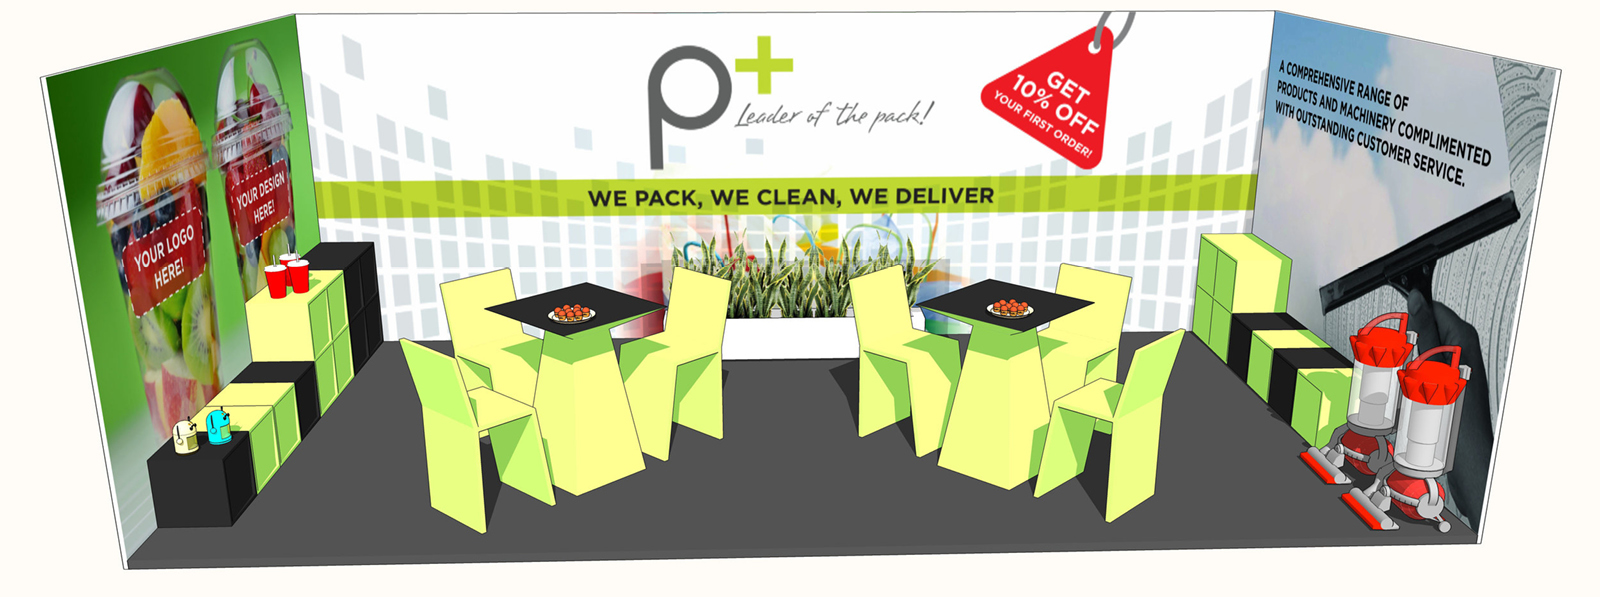 Our+Services+-+Slider+Images+6.jpg